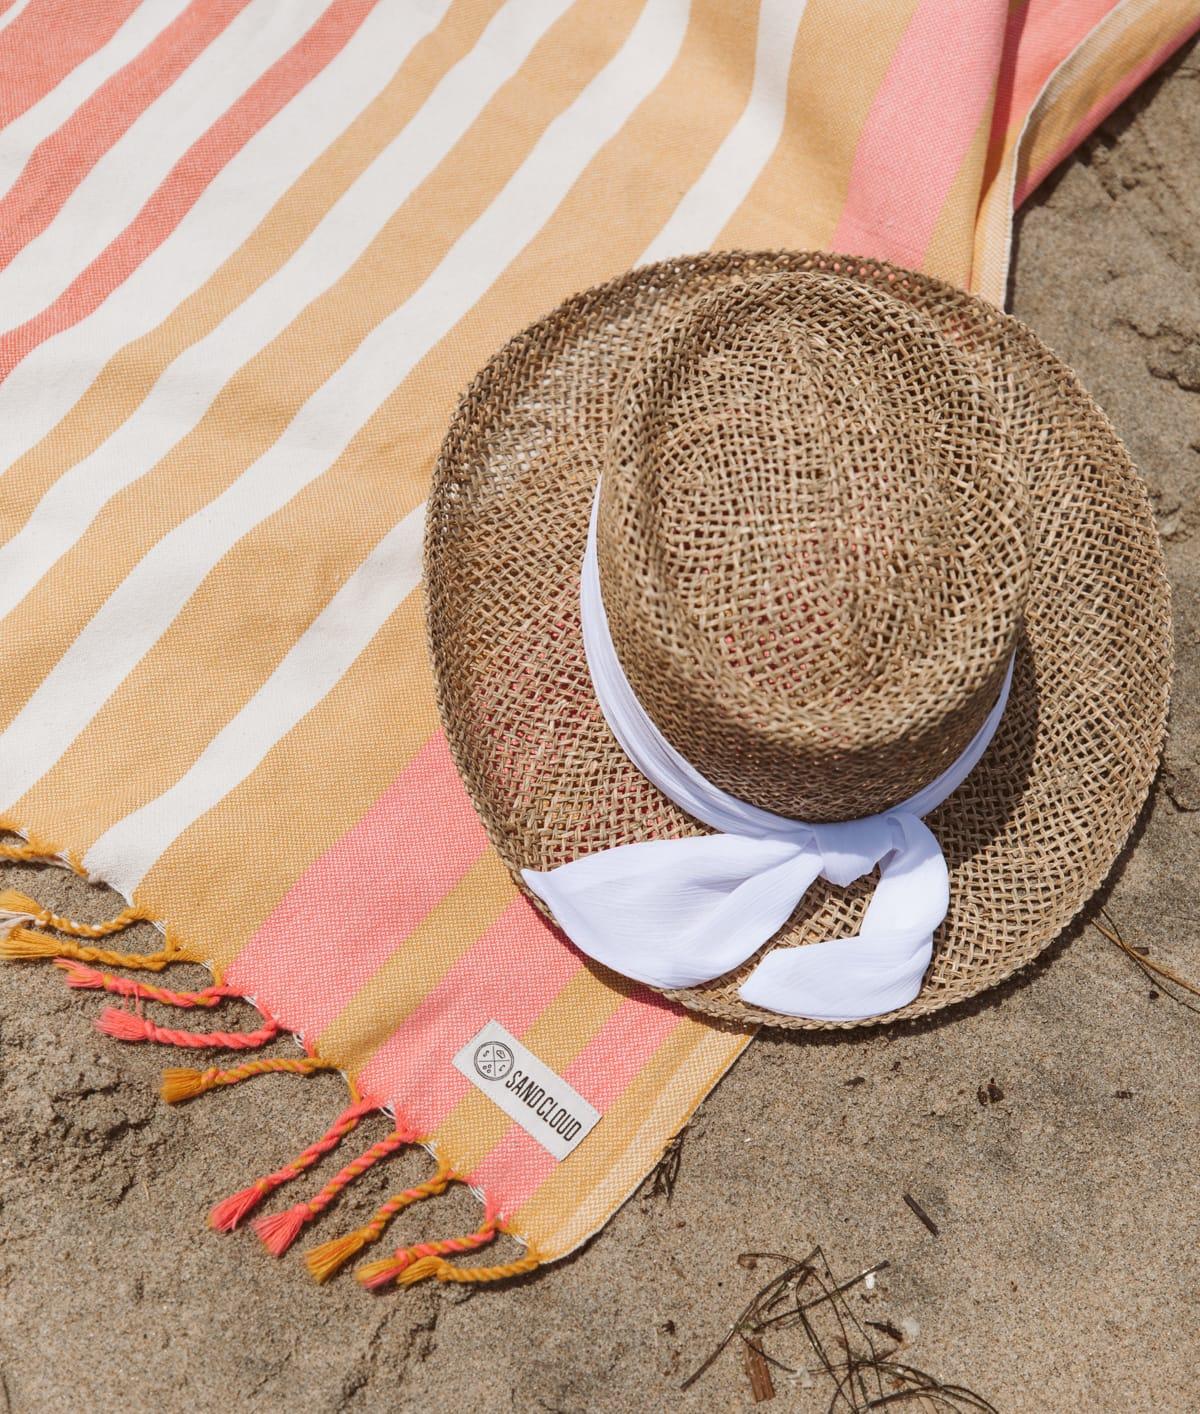 best beach towel from QVC